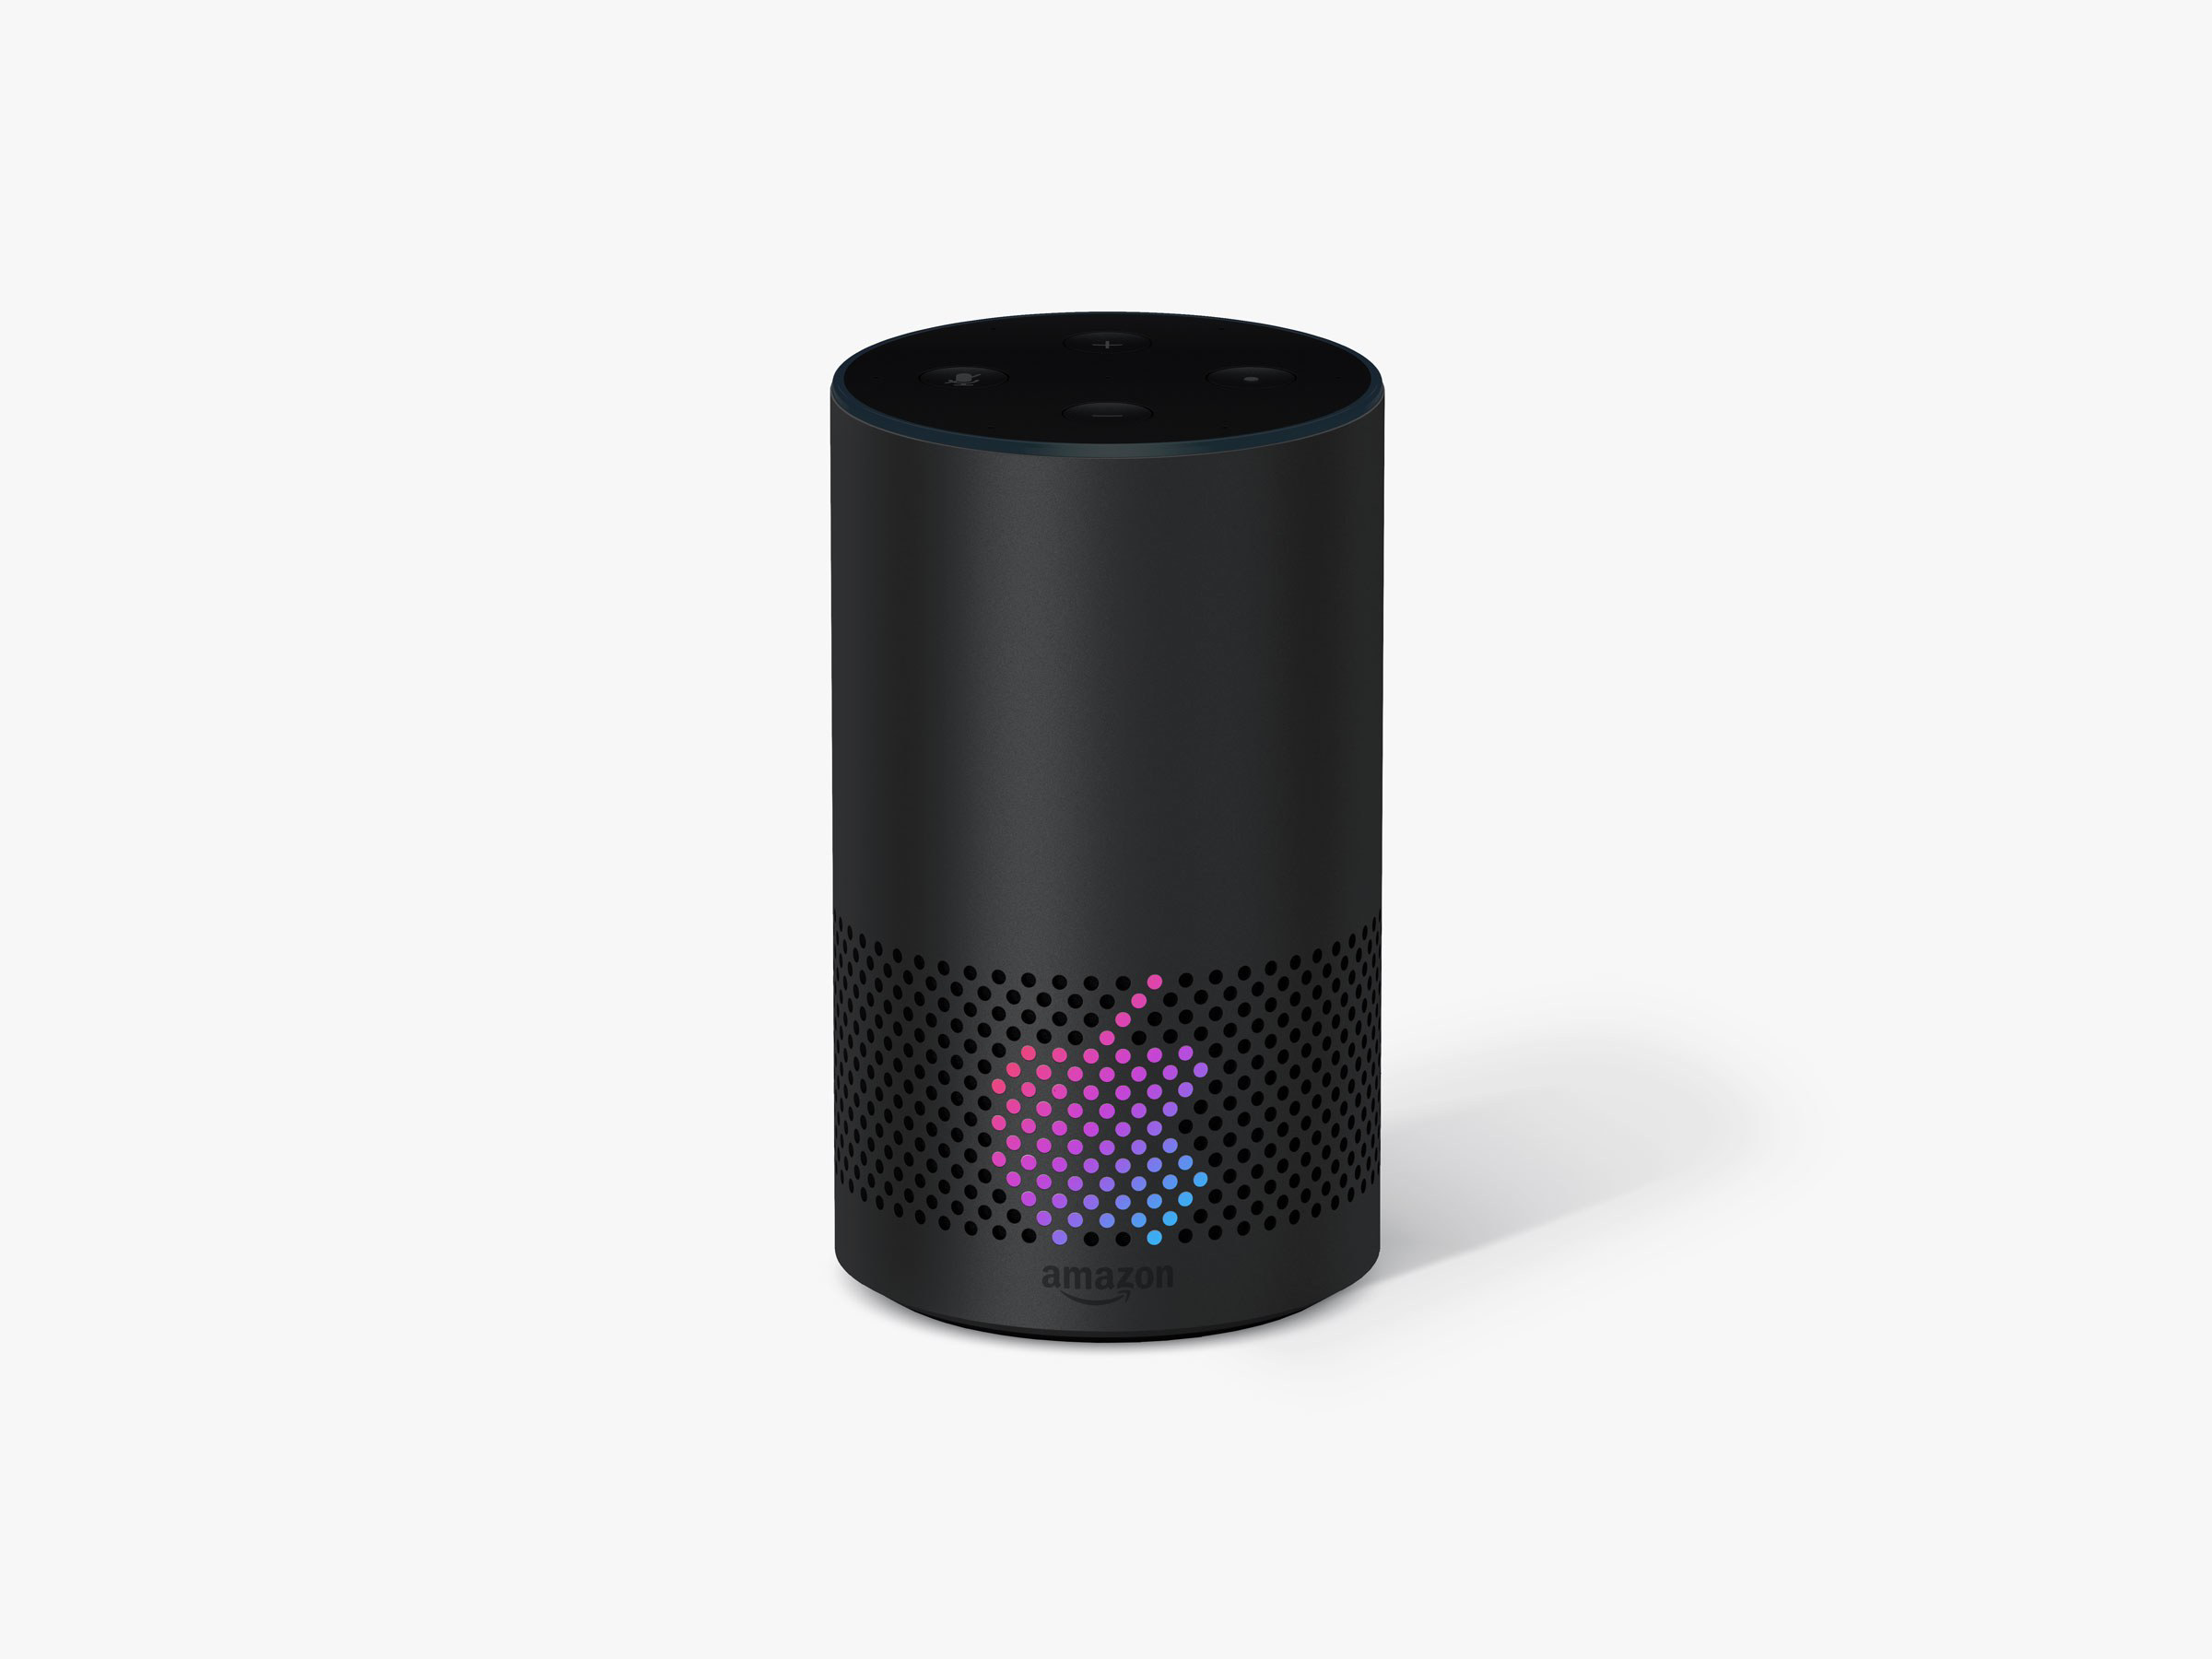 Amazon- Echo - support - Apple Music